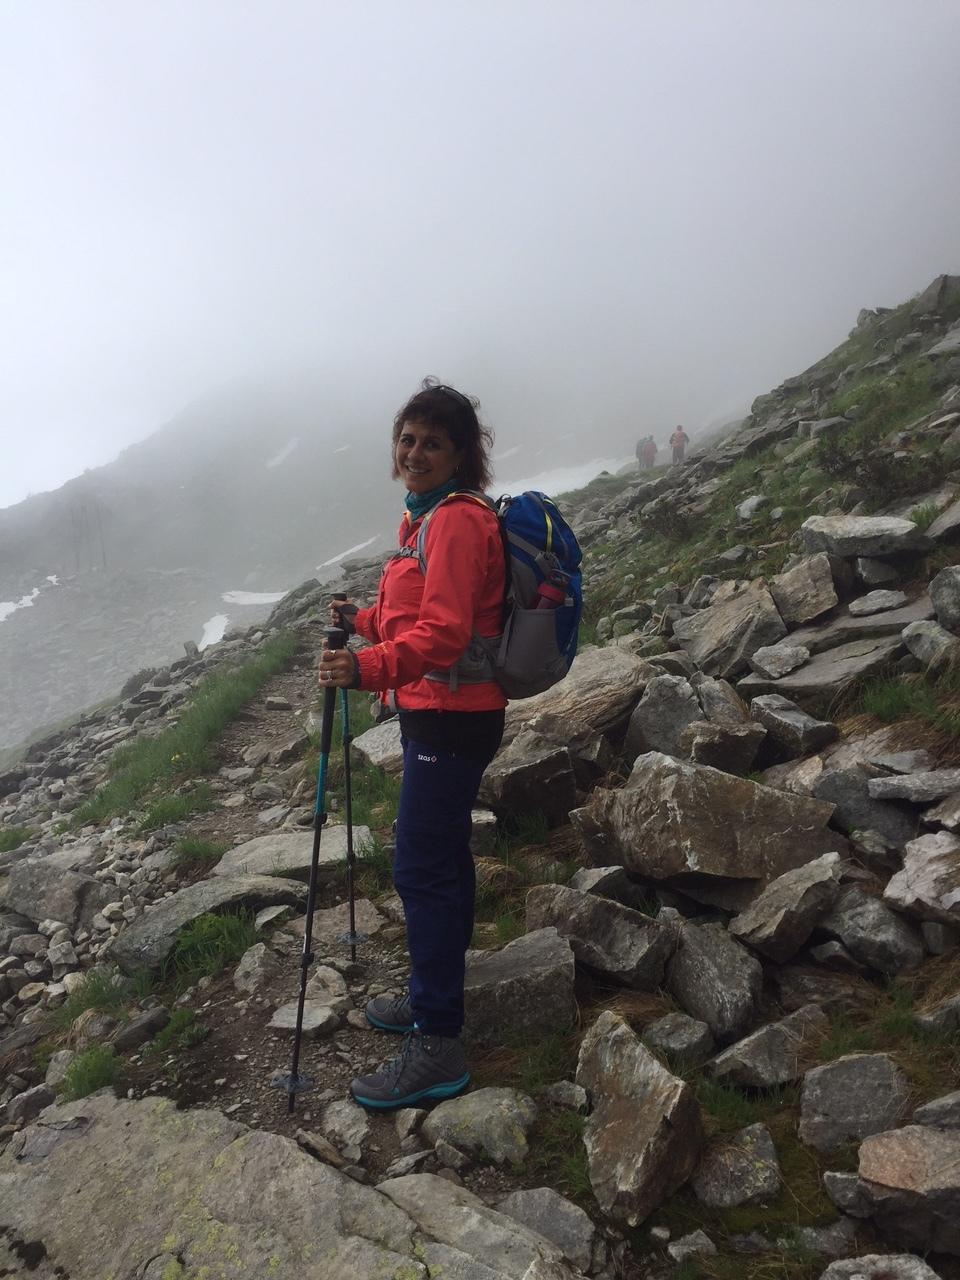 Tour Du Mont Blanc (Chamonix, France) Day 1